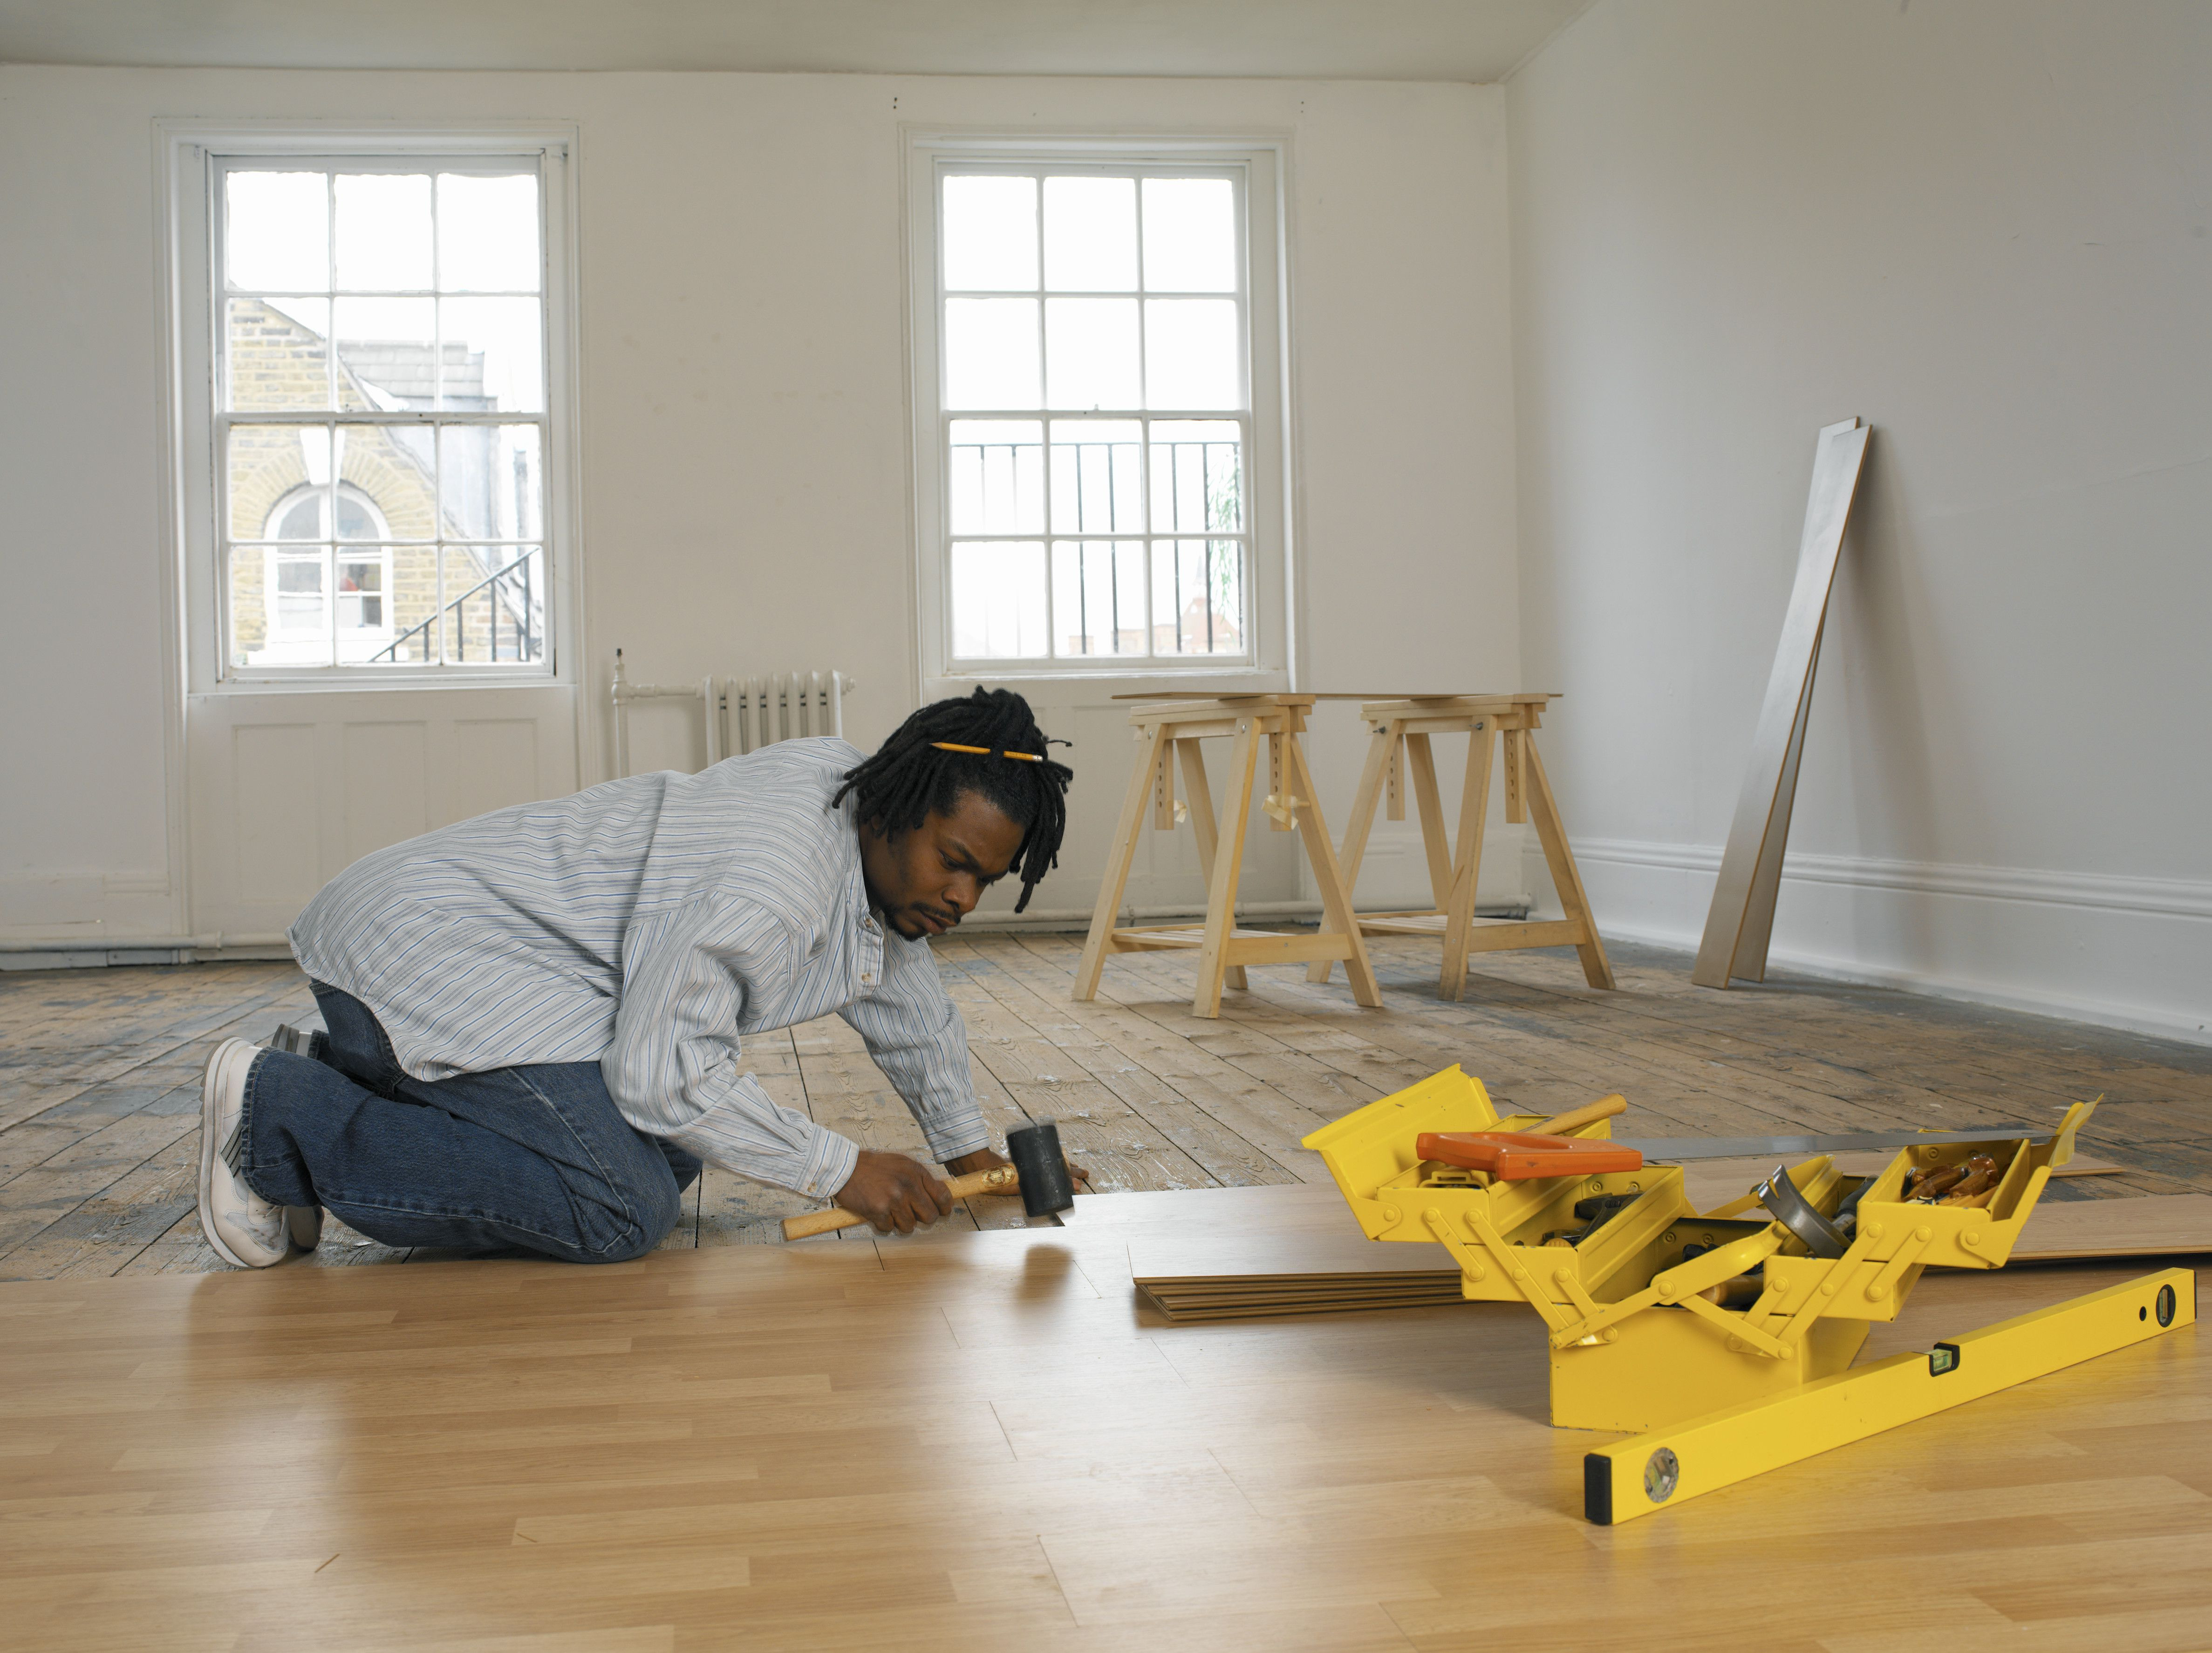 bruce hardwood flooring company of major manufacturing brands for laminate flooring regarding laying laminate flooring